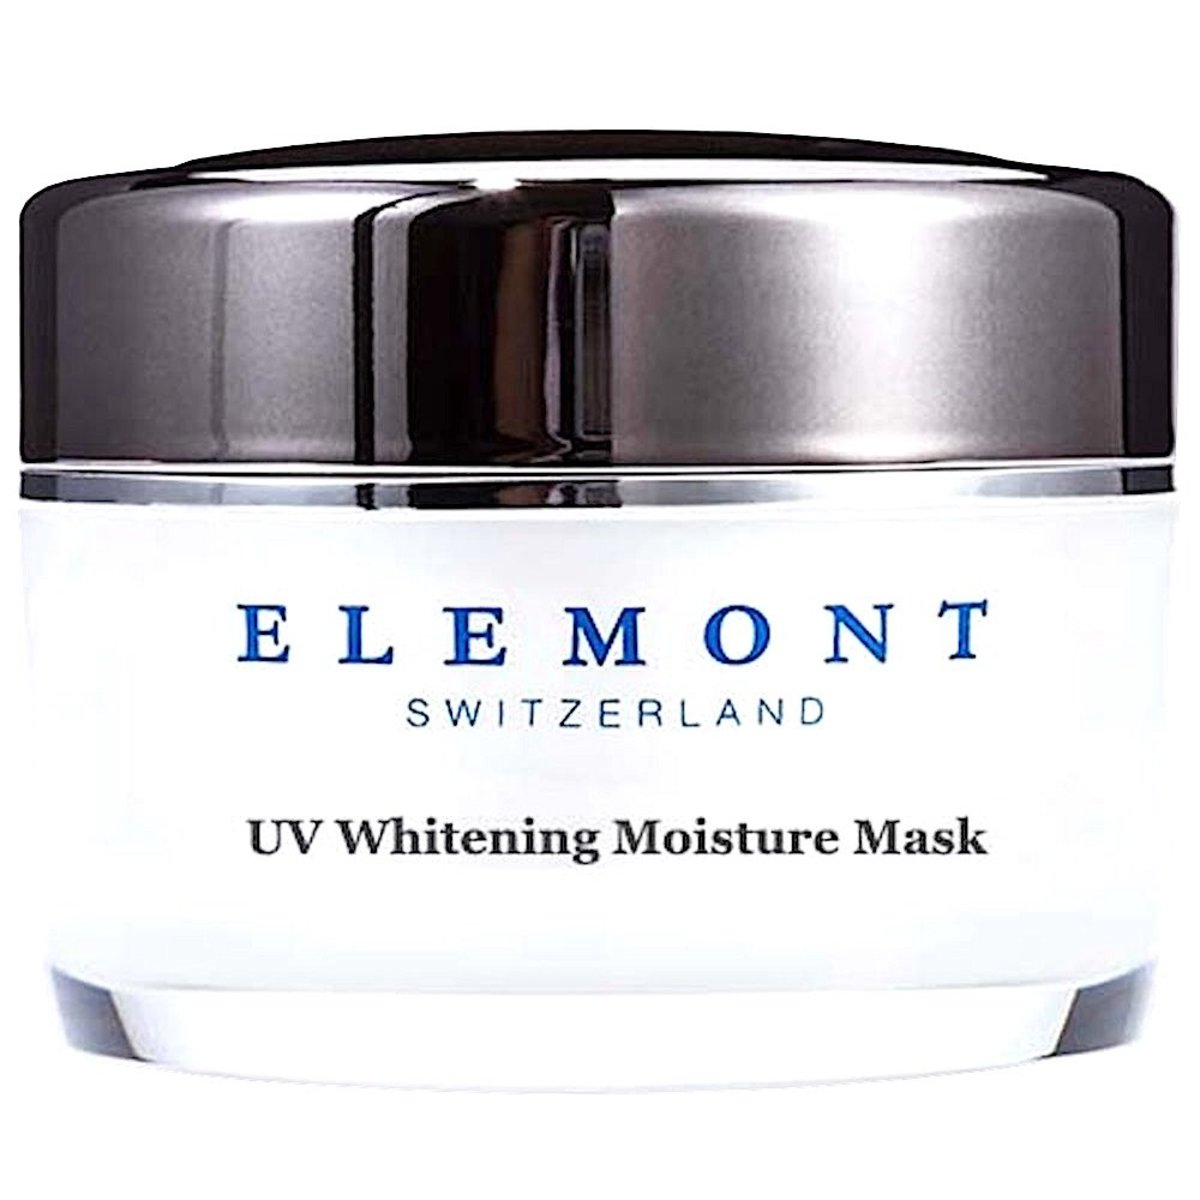 UV Whitening Moisture Mask